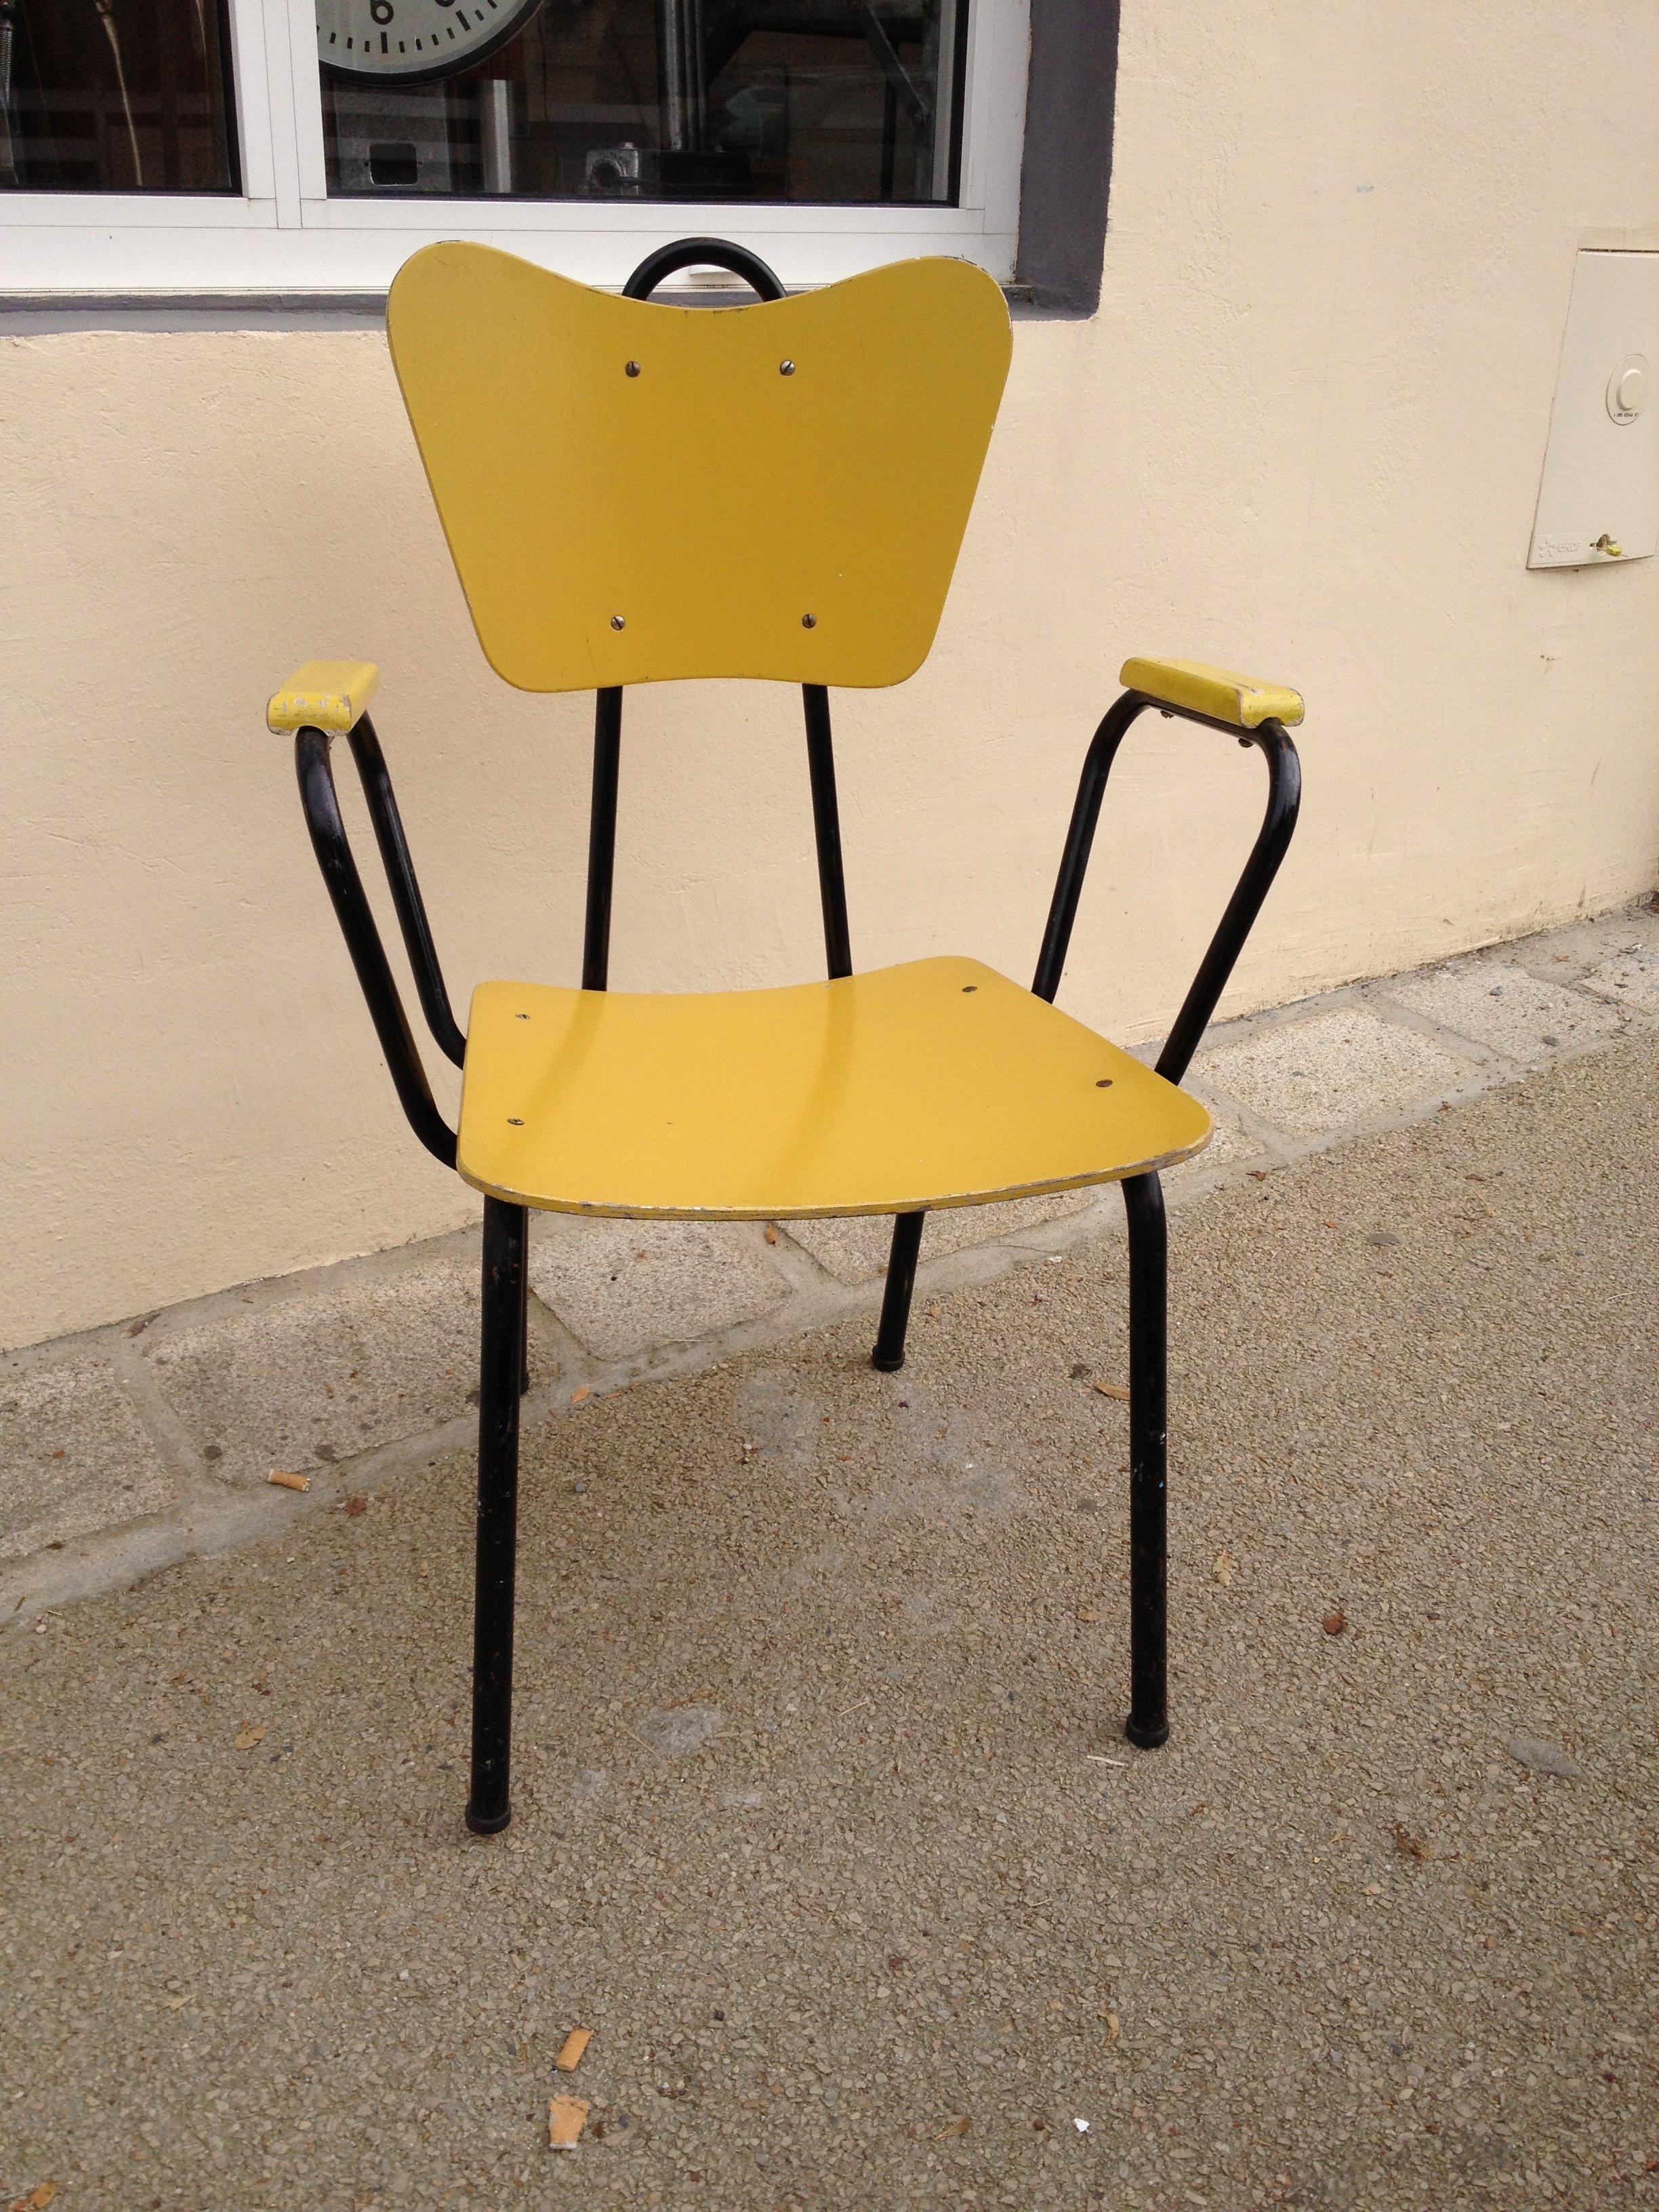 3 chaises design des ann es 50 at bertrand legrix - Chaise design annee 50 ...